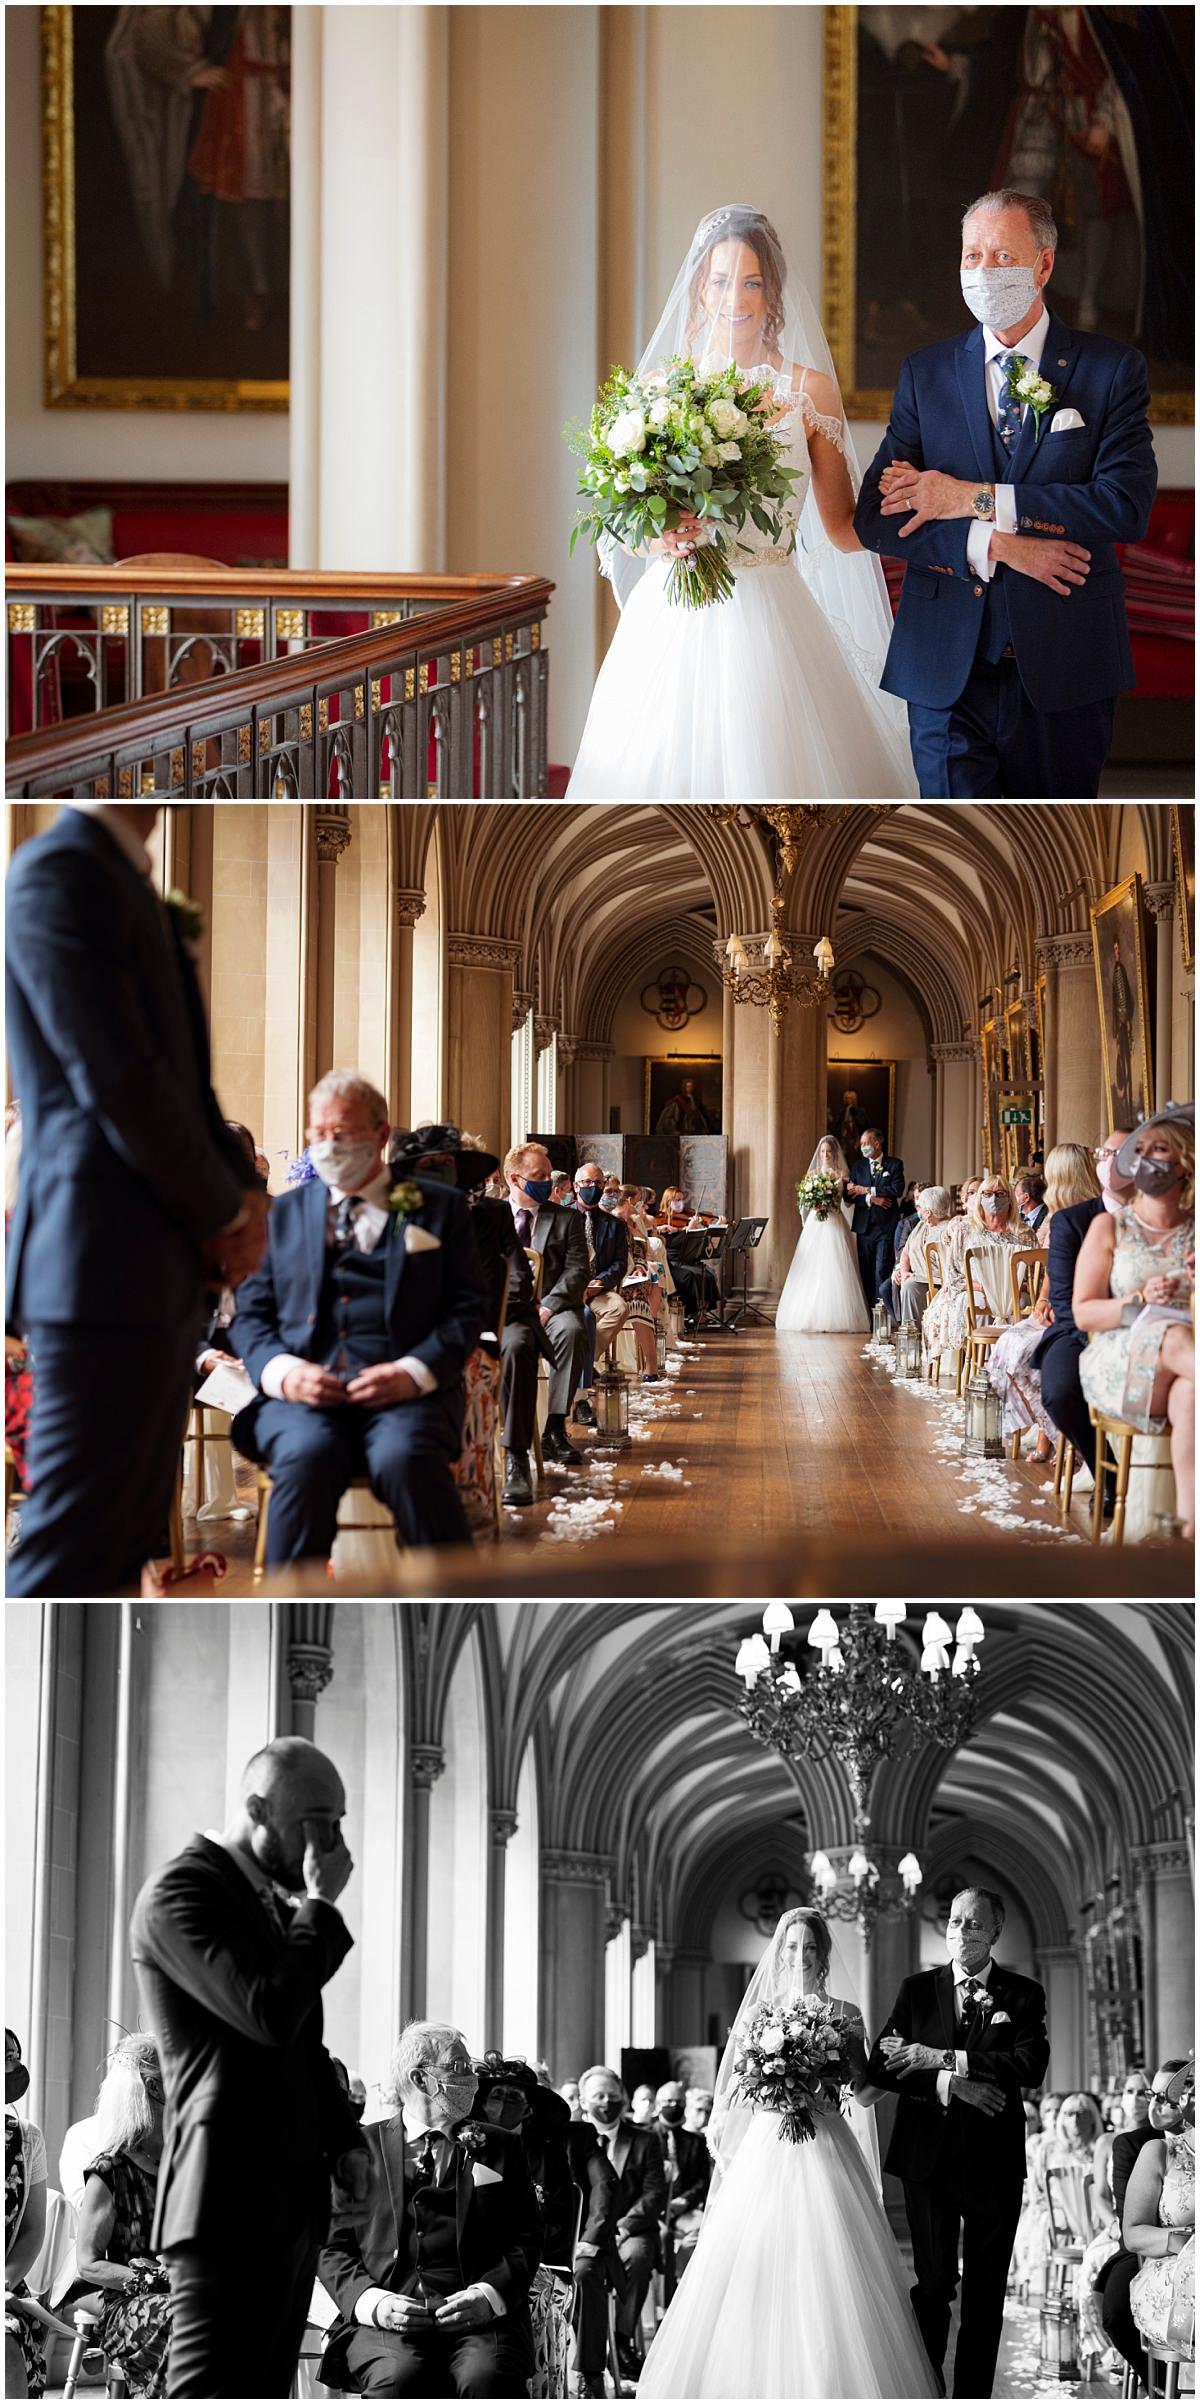 Belvoir Castle Wedding ceremony